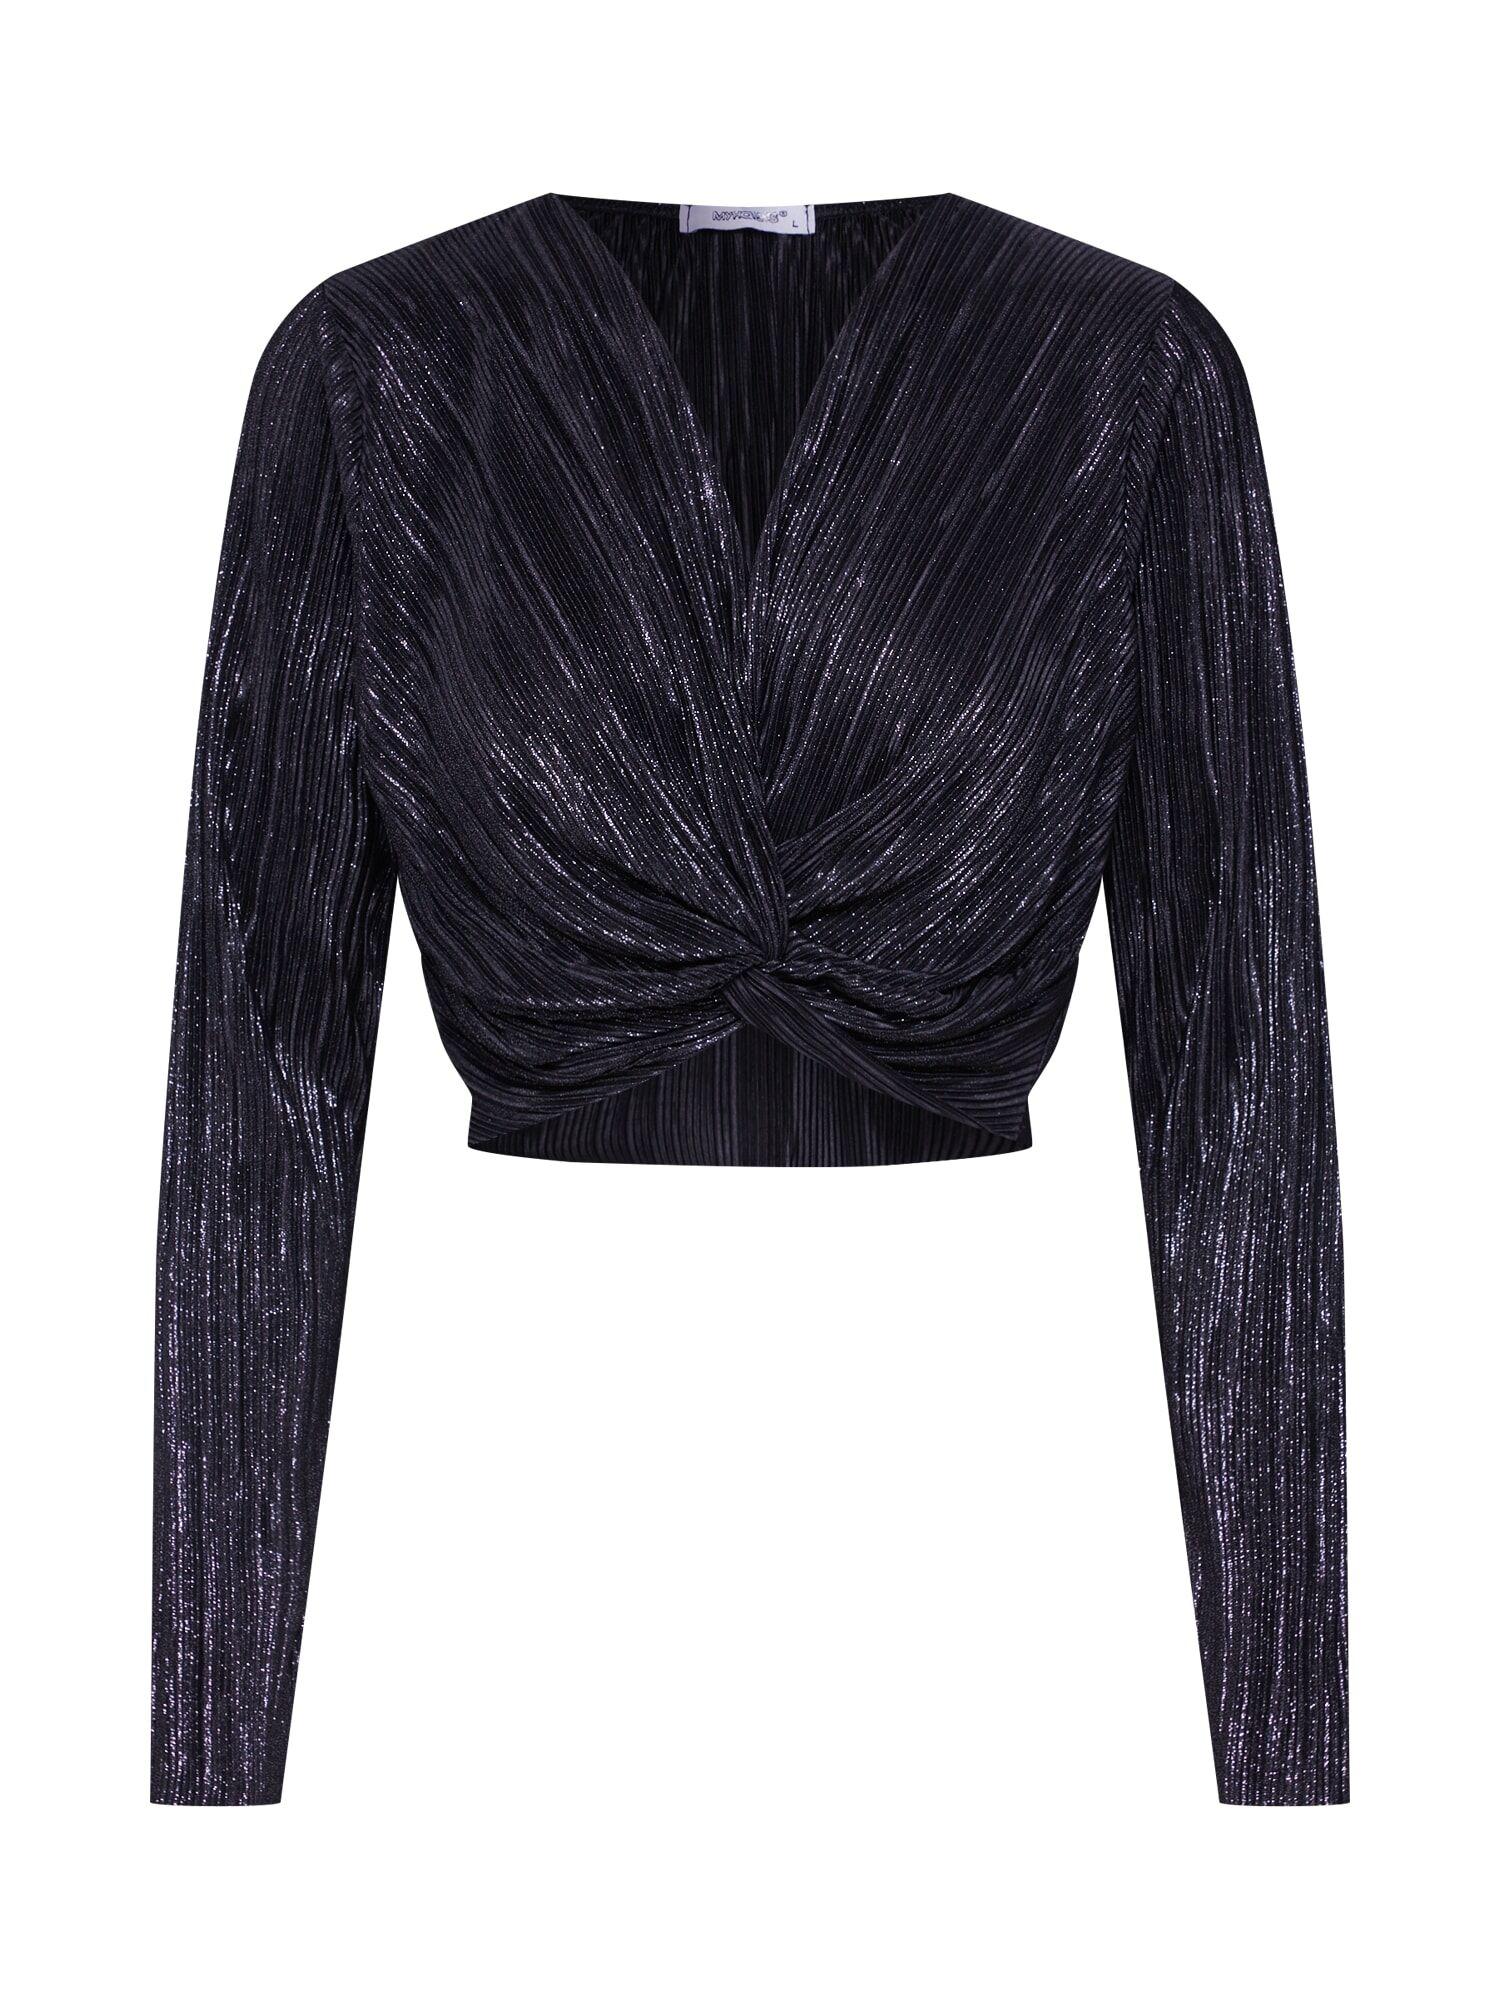 Hailys T-shirt 'LS P TP Lya'  - Noir - Taille: L - female